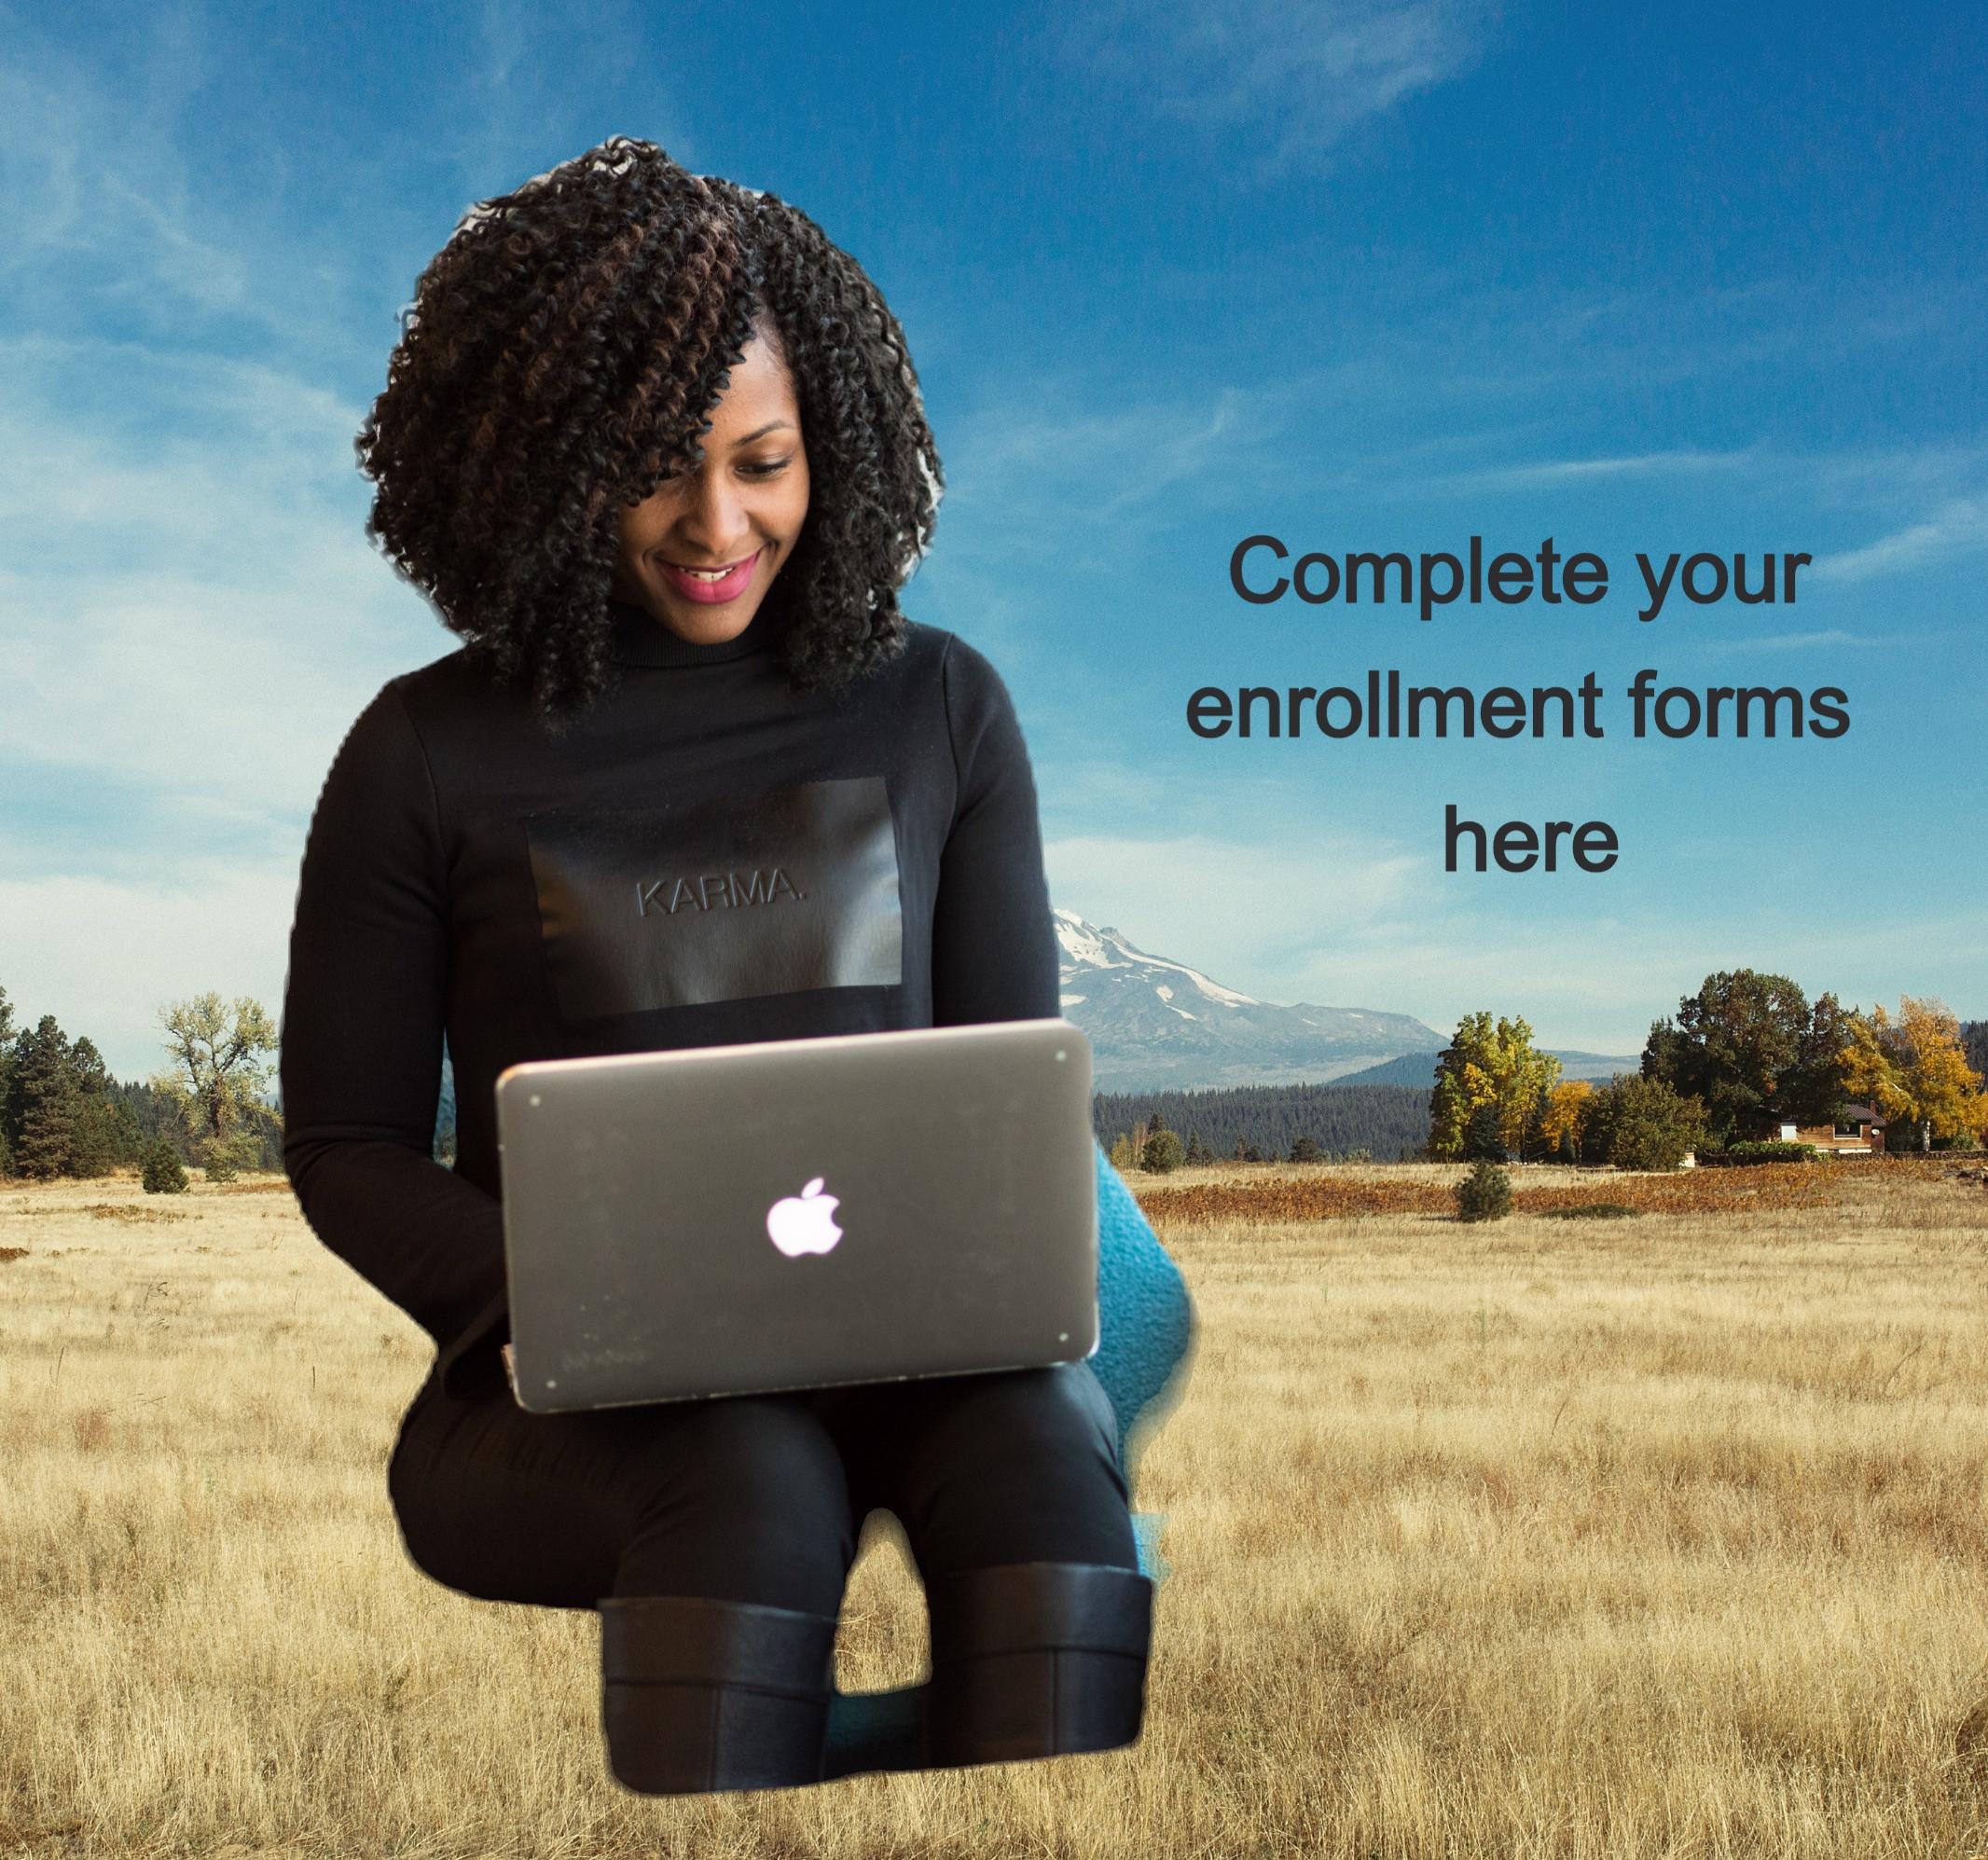 Client enrollment and Consent